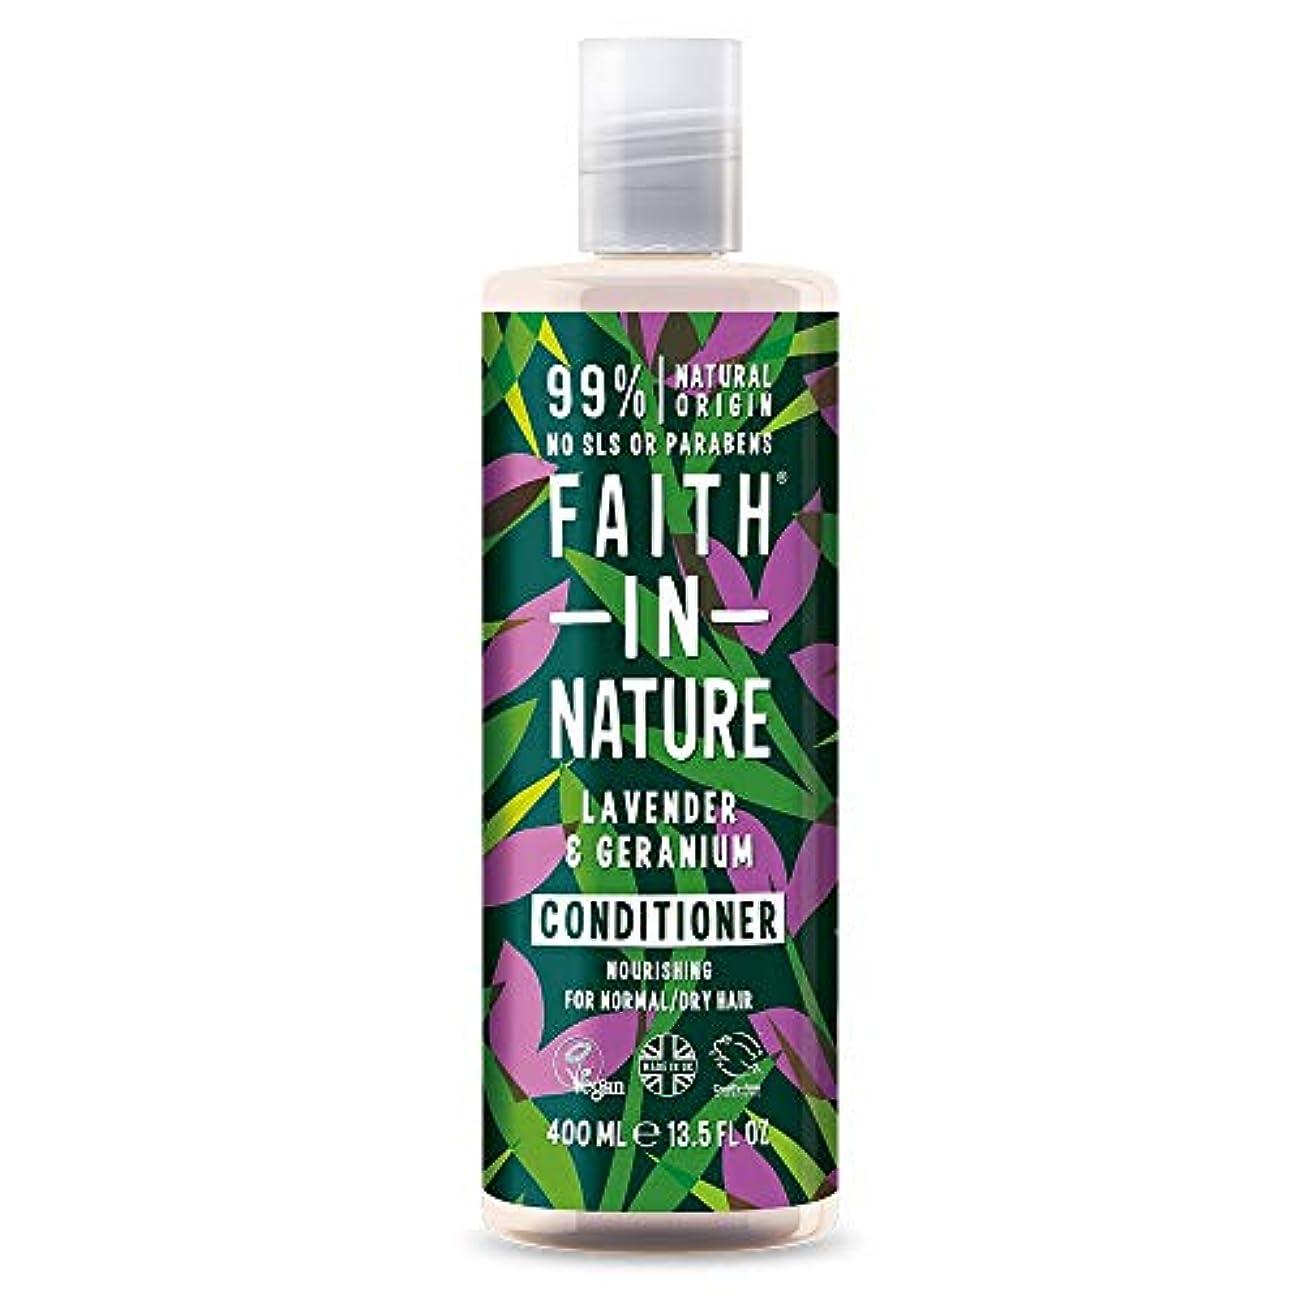 Faith In Nature Lavender & Geranium Conditioner Normal To Dry Hair 400ml